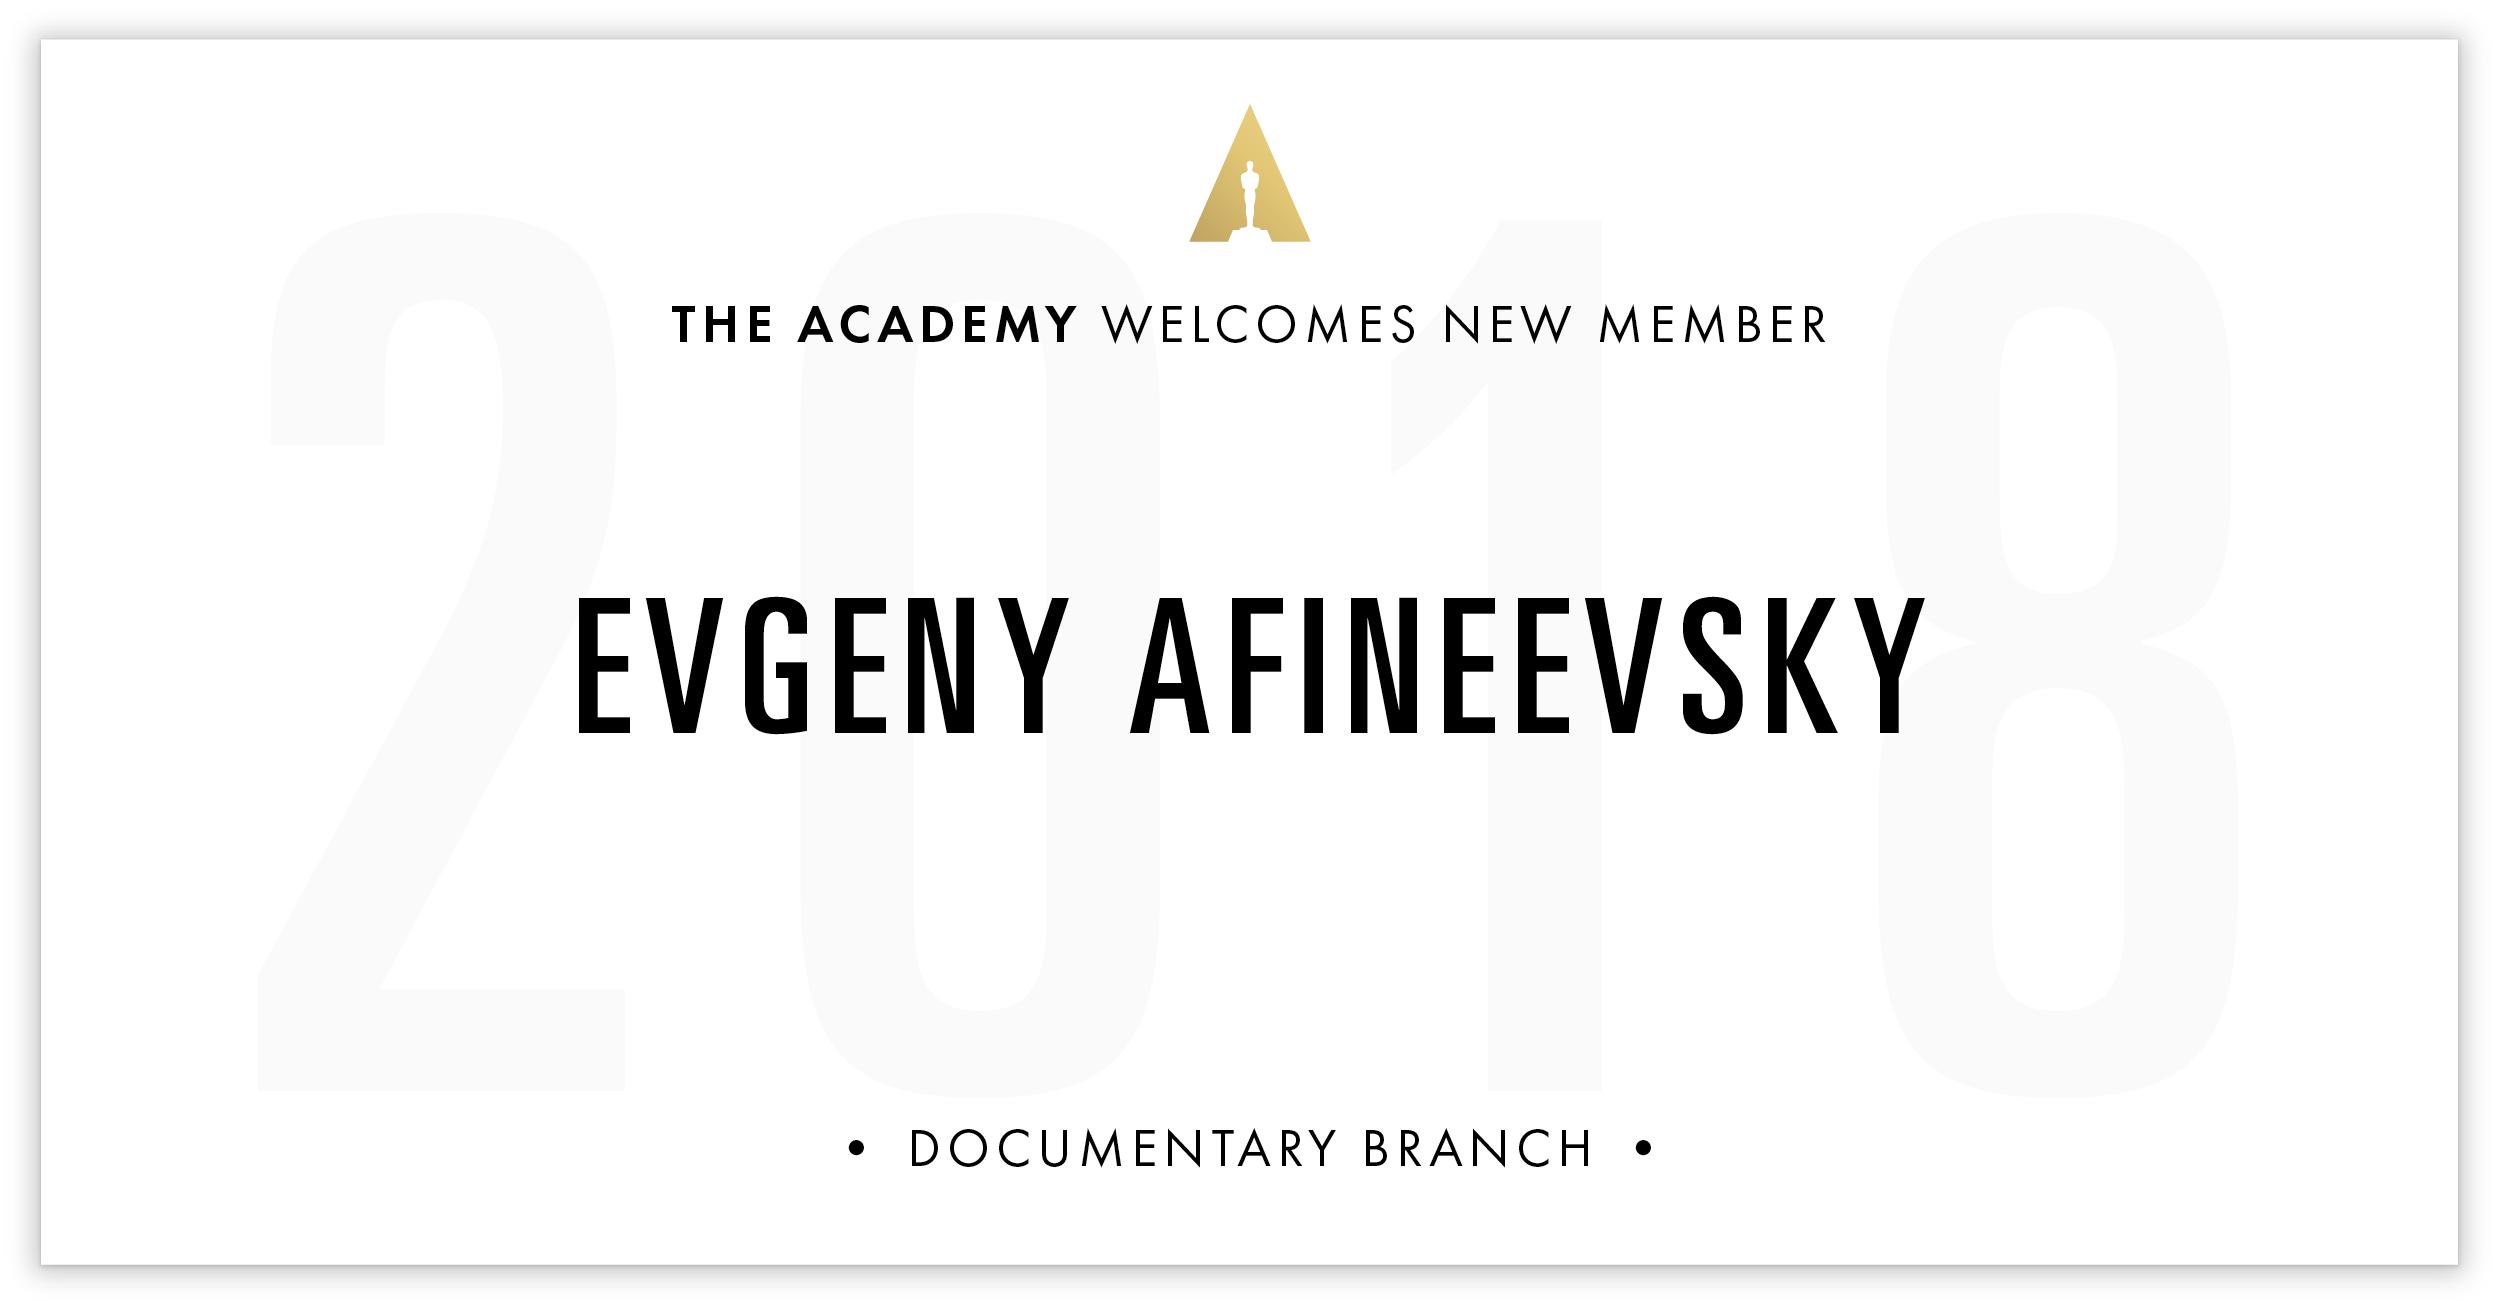 Evgeny Afineevsky is invited!